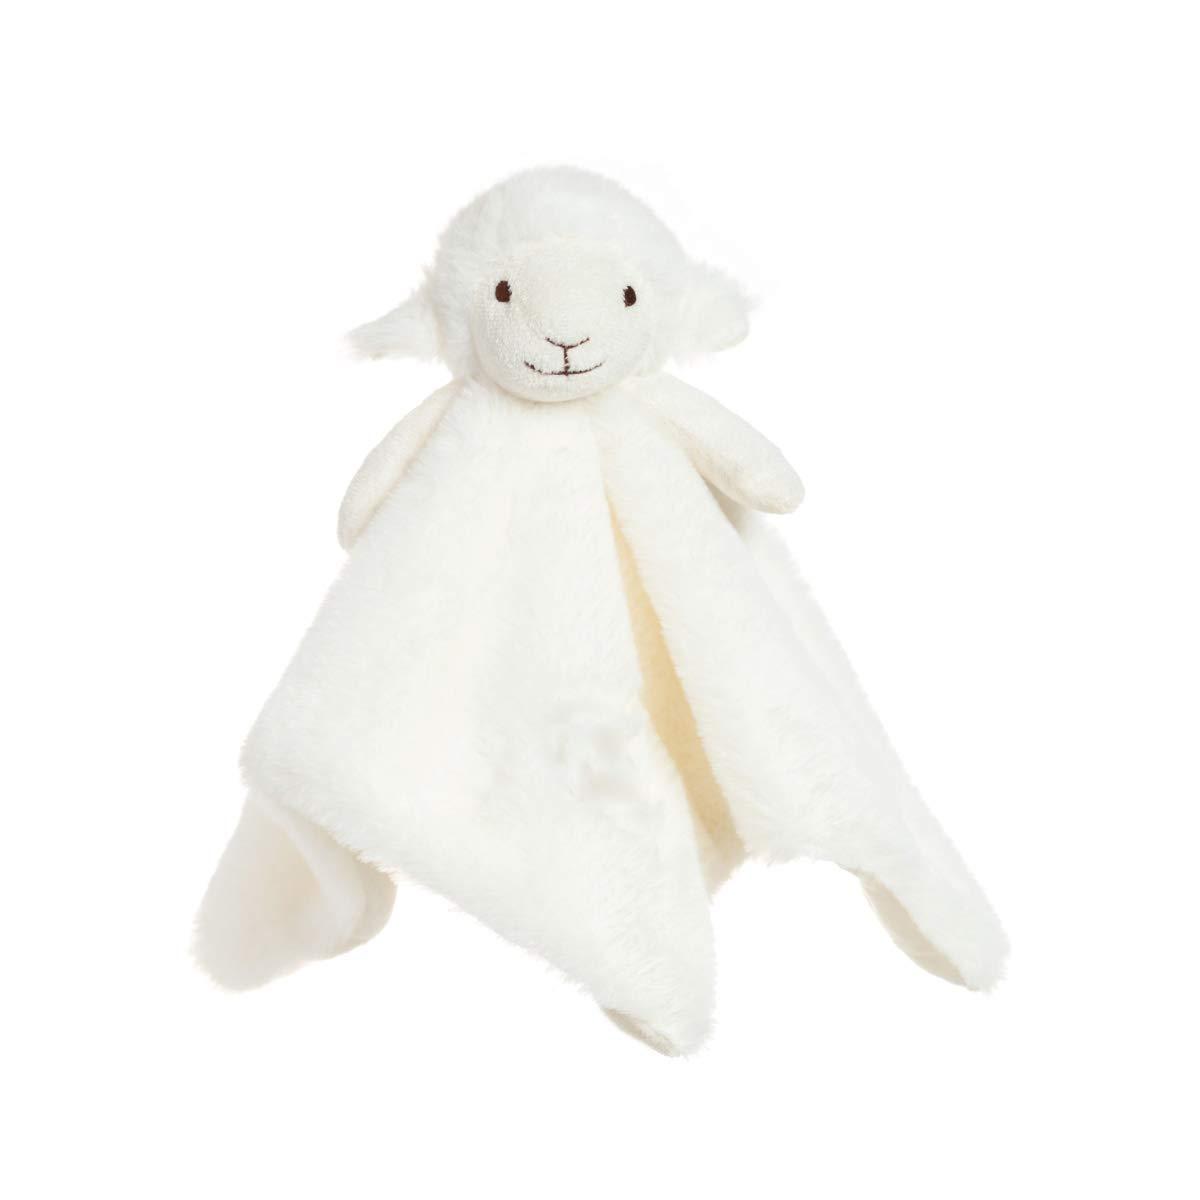 Apricot Lamb Luxury Snuggle Plush White Lamb Sheep Infant Stuffed Animals Security Blanket Nursery Character Blanket(White Lamb, 14 Inches)